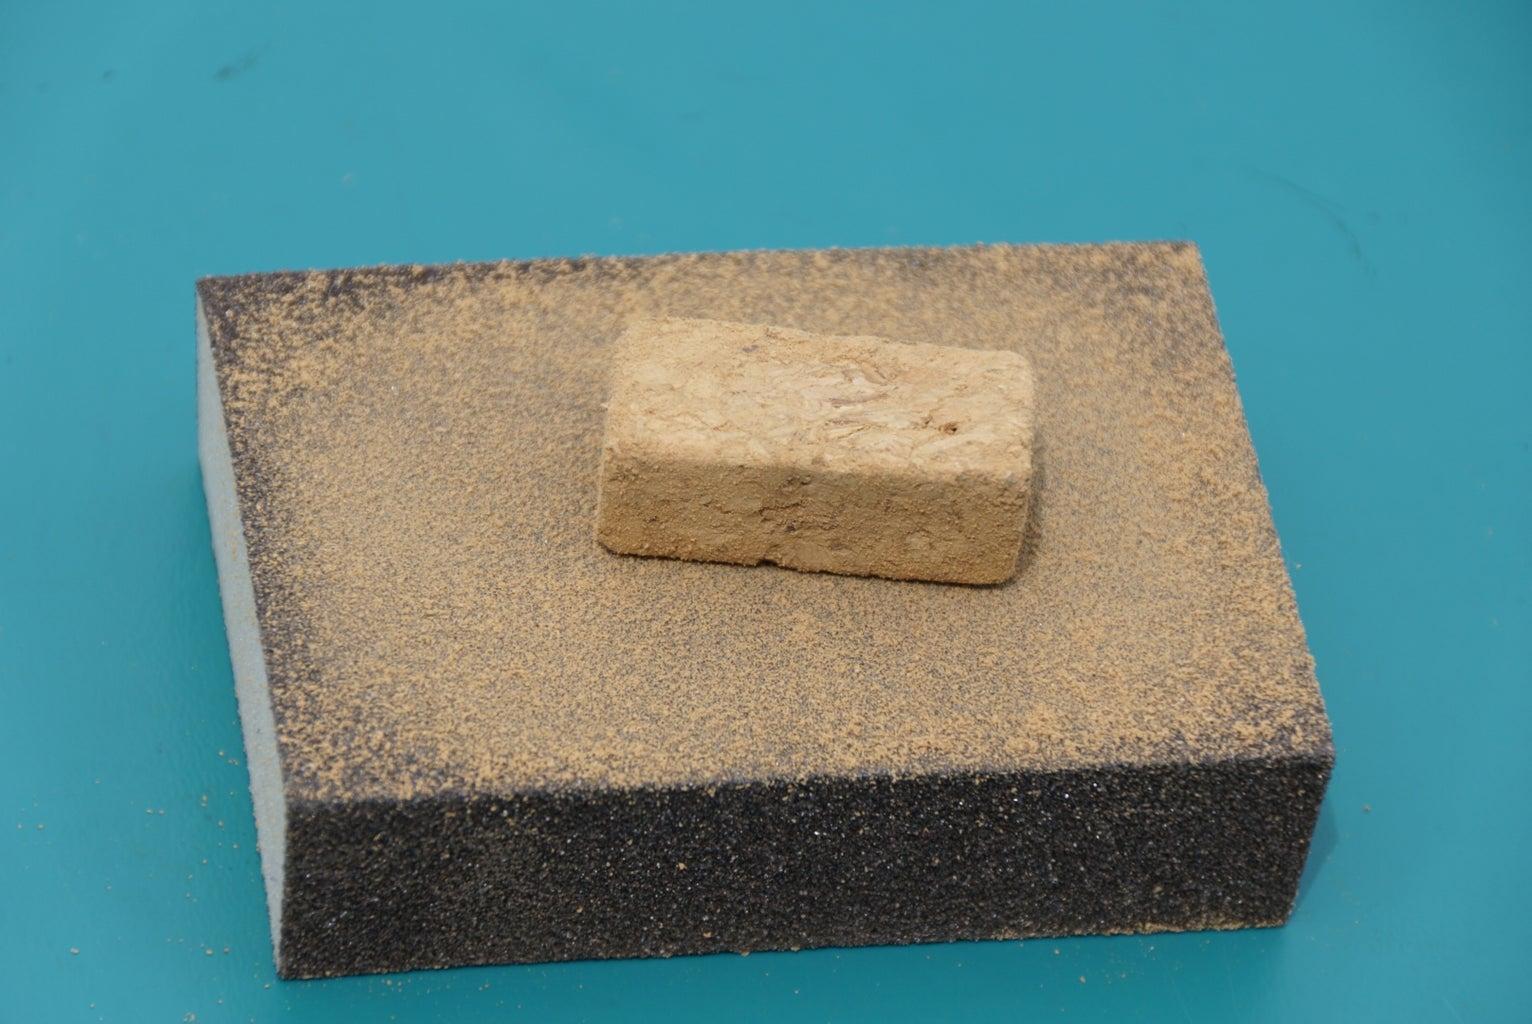 Cut Your Cork Block